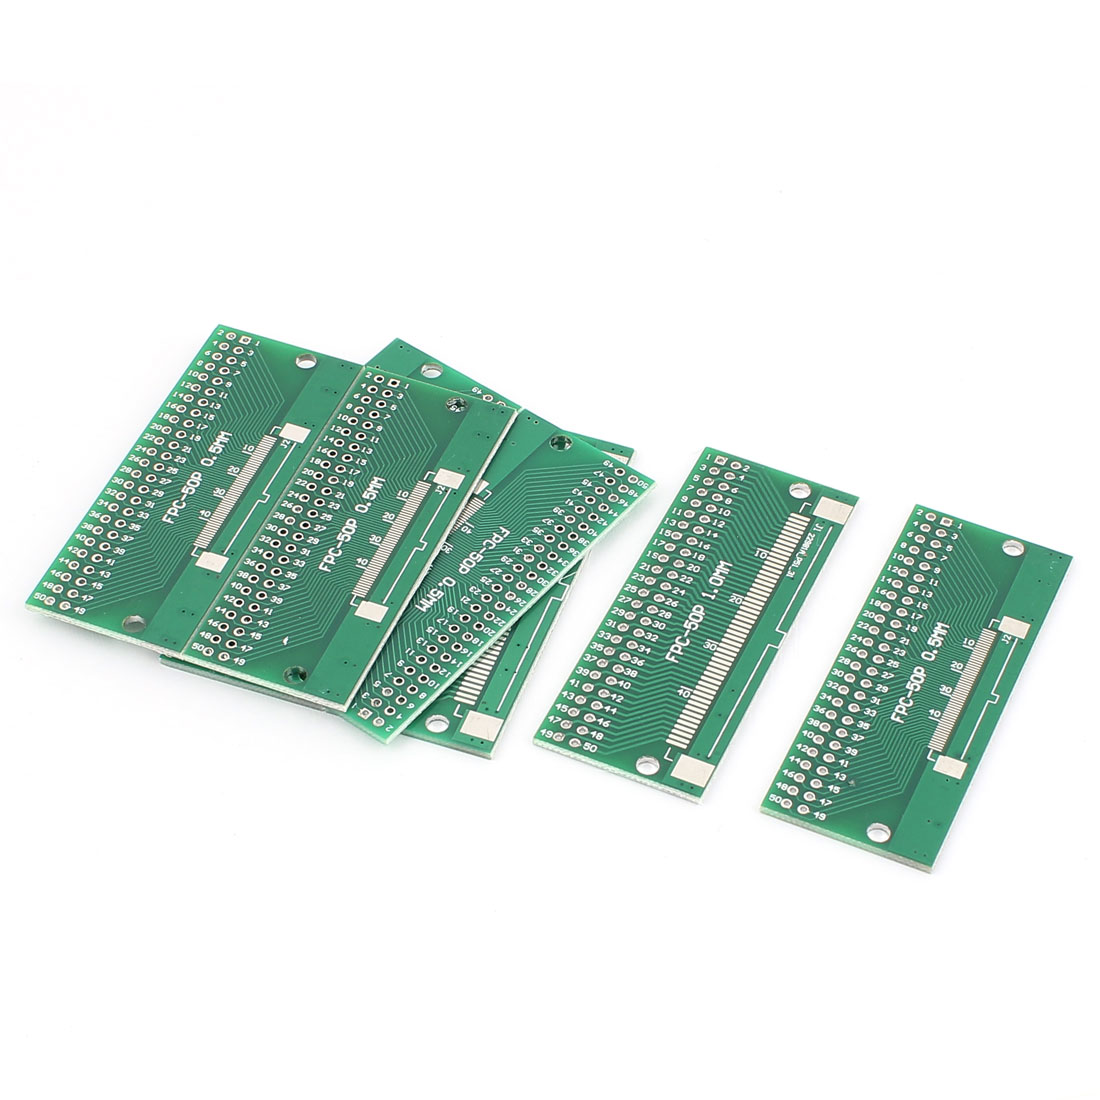 8Pcs 65 x 26mm 50Pins Adapter PCB Converter Board